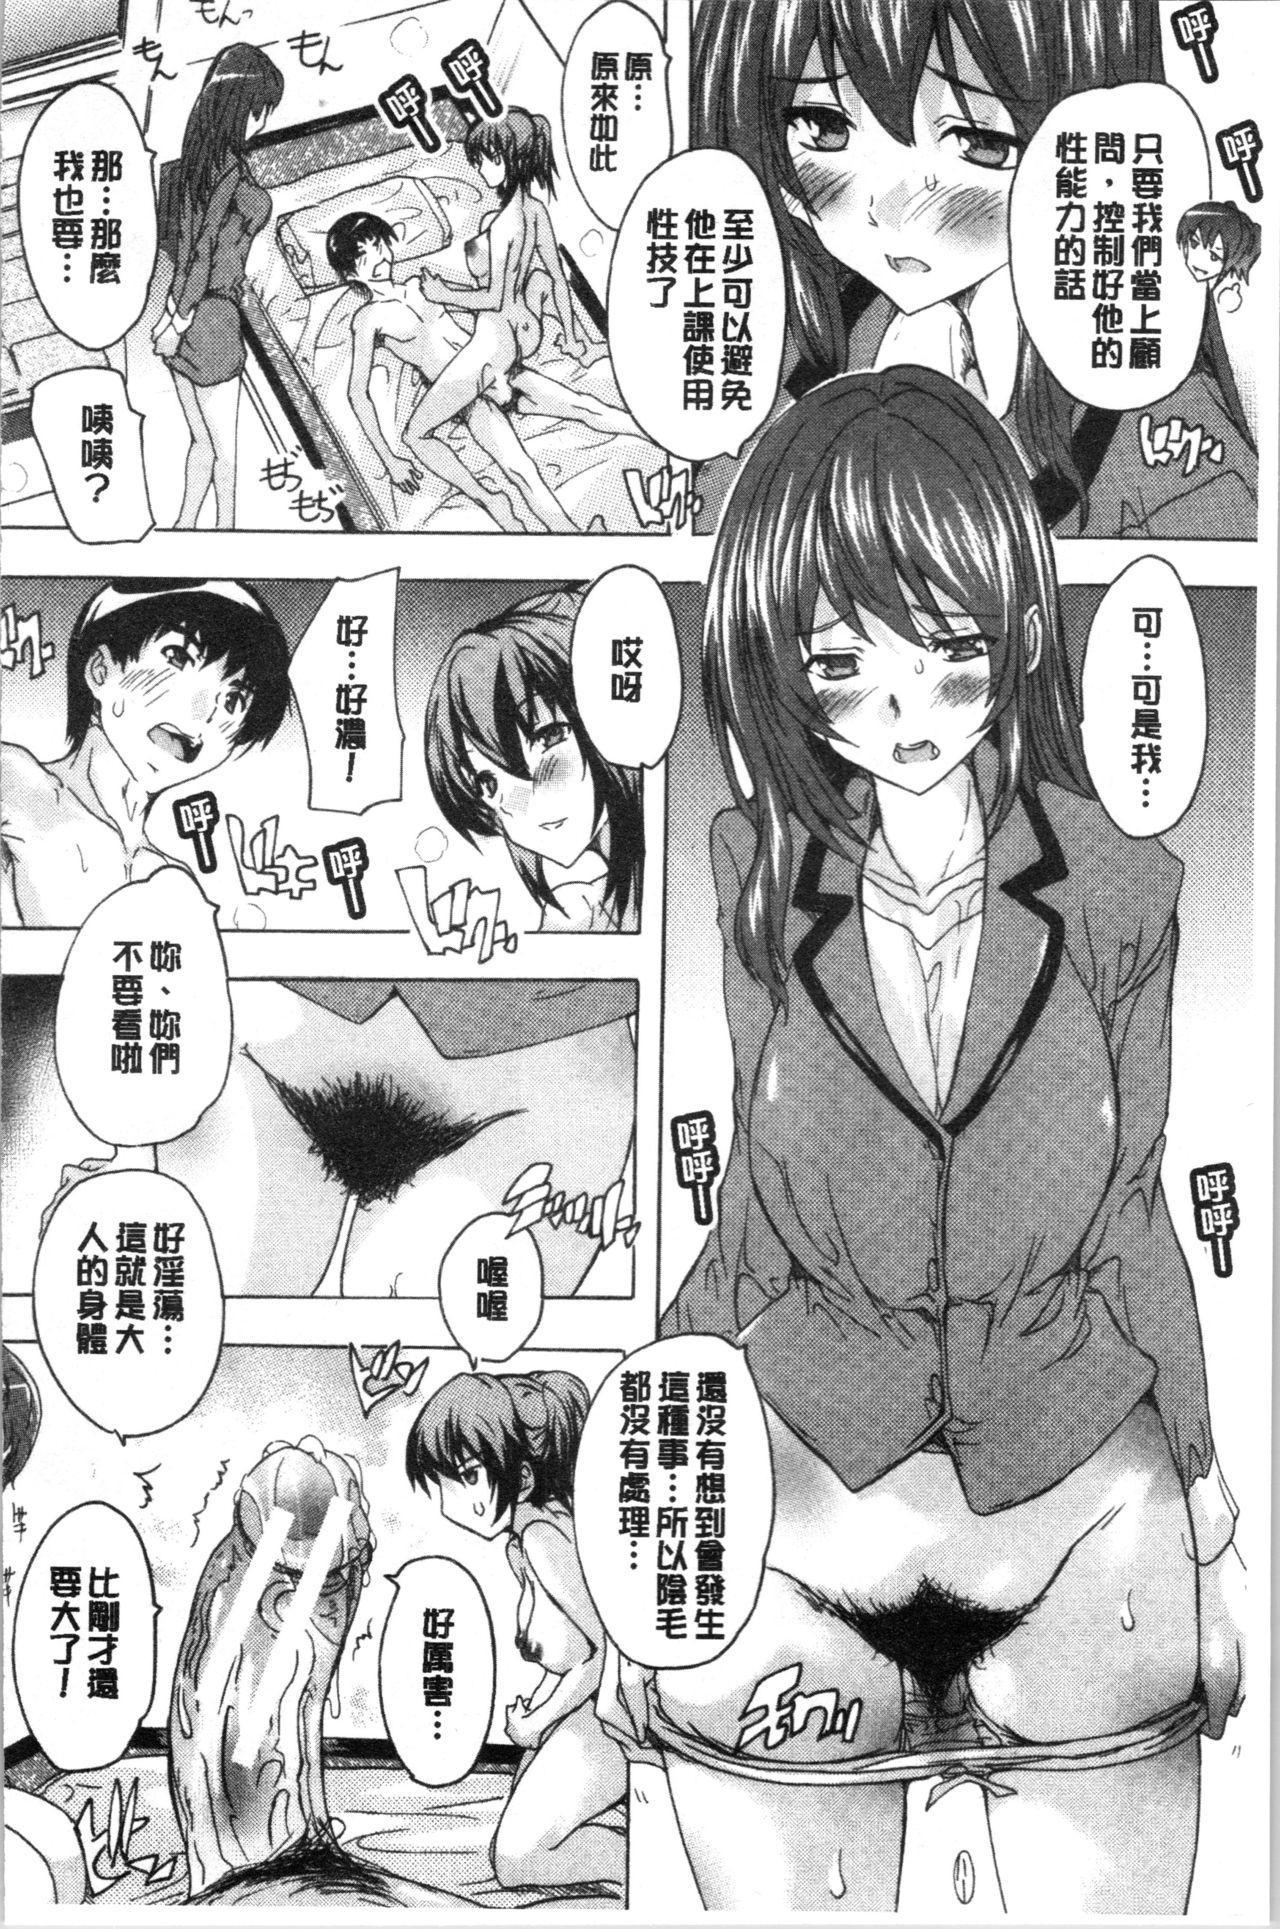 [Natsuka Q-Ya] Hisshuu!! Sex-bu - SEIGI-DO The Ultimate Martial Arts   必修!!性愛淫交部 [Chinese] 126